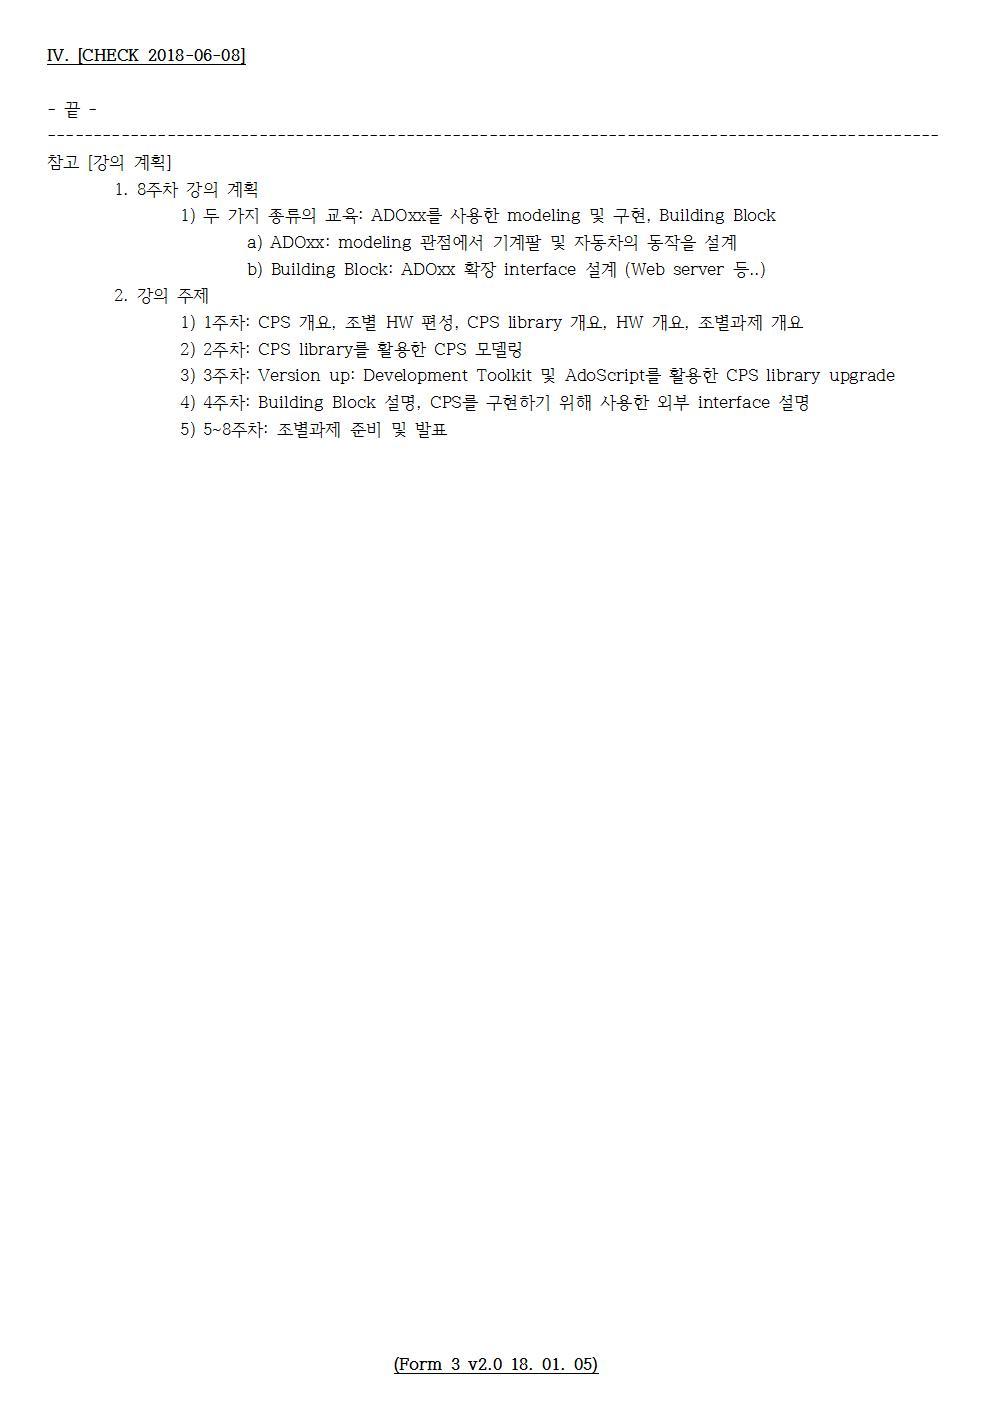 D-[18-004-RD-04]-[우주기초 과제]-[2018-06-14][SH]002.jpg